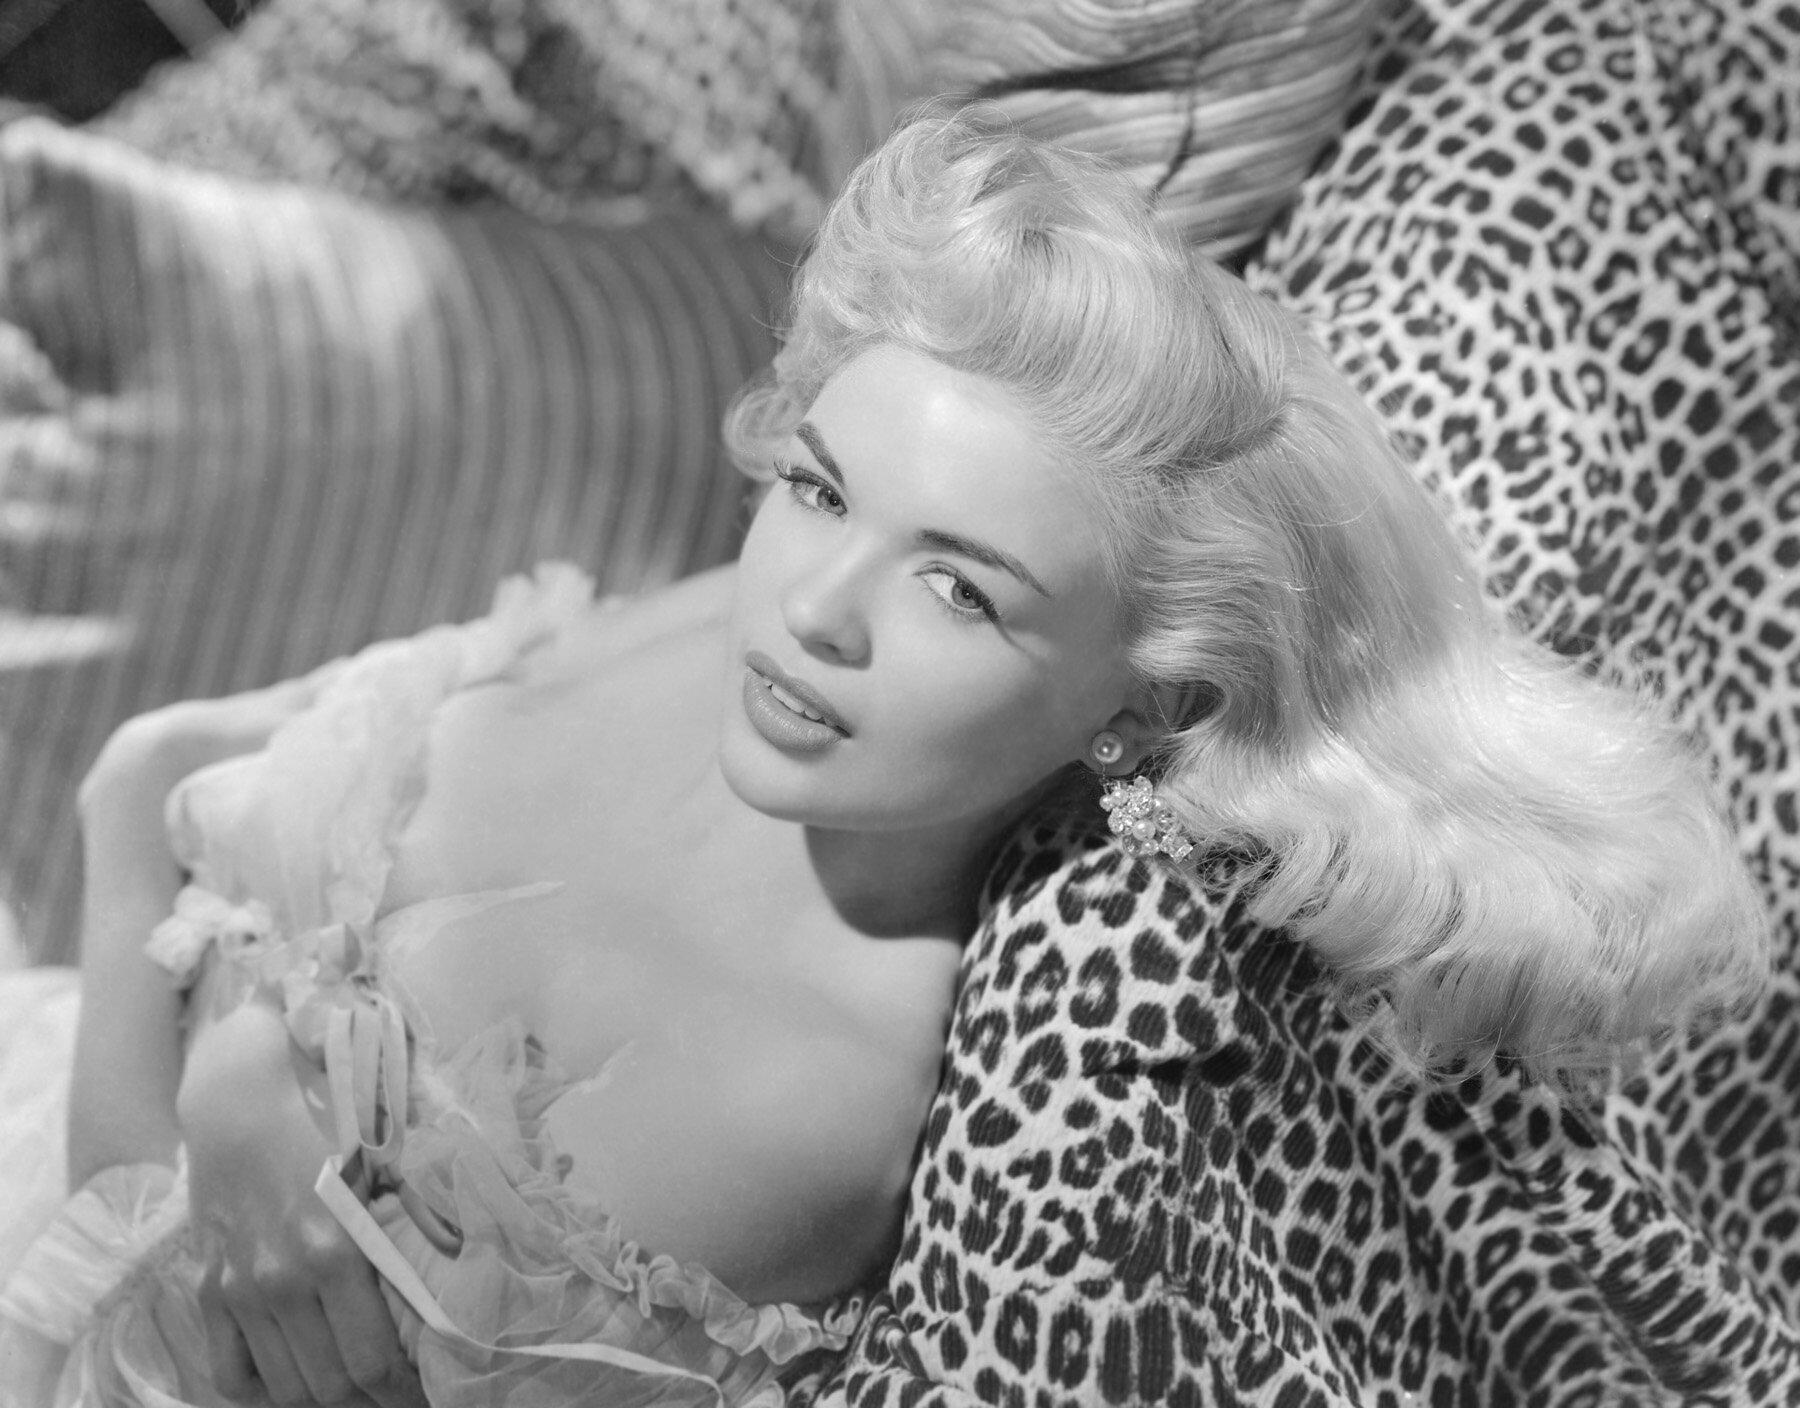 jayne-1955-film-illegal-studio-by_bert_six-1